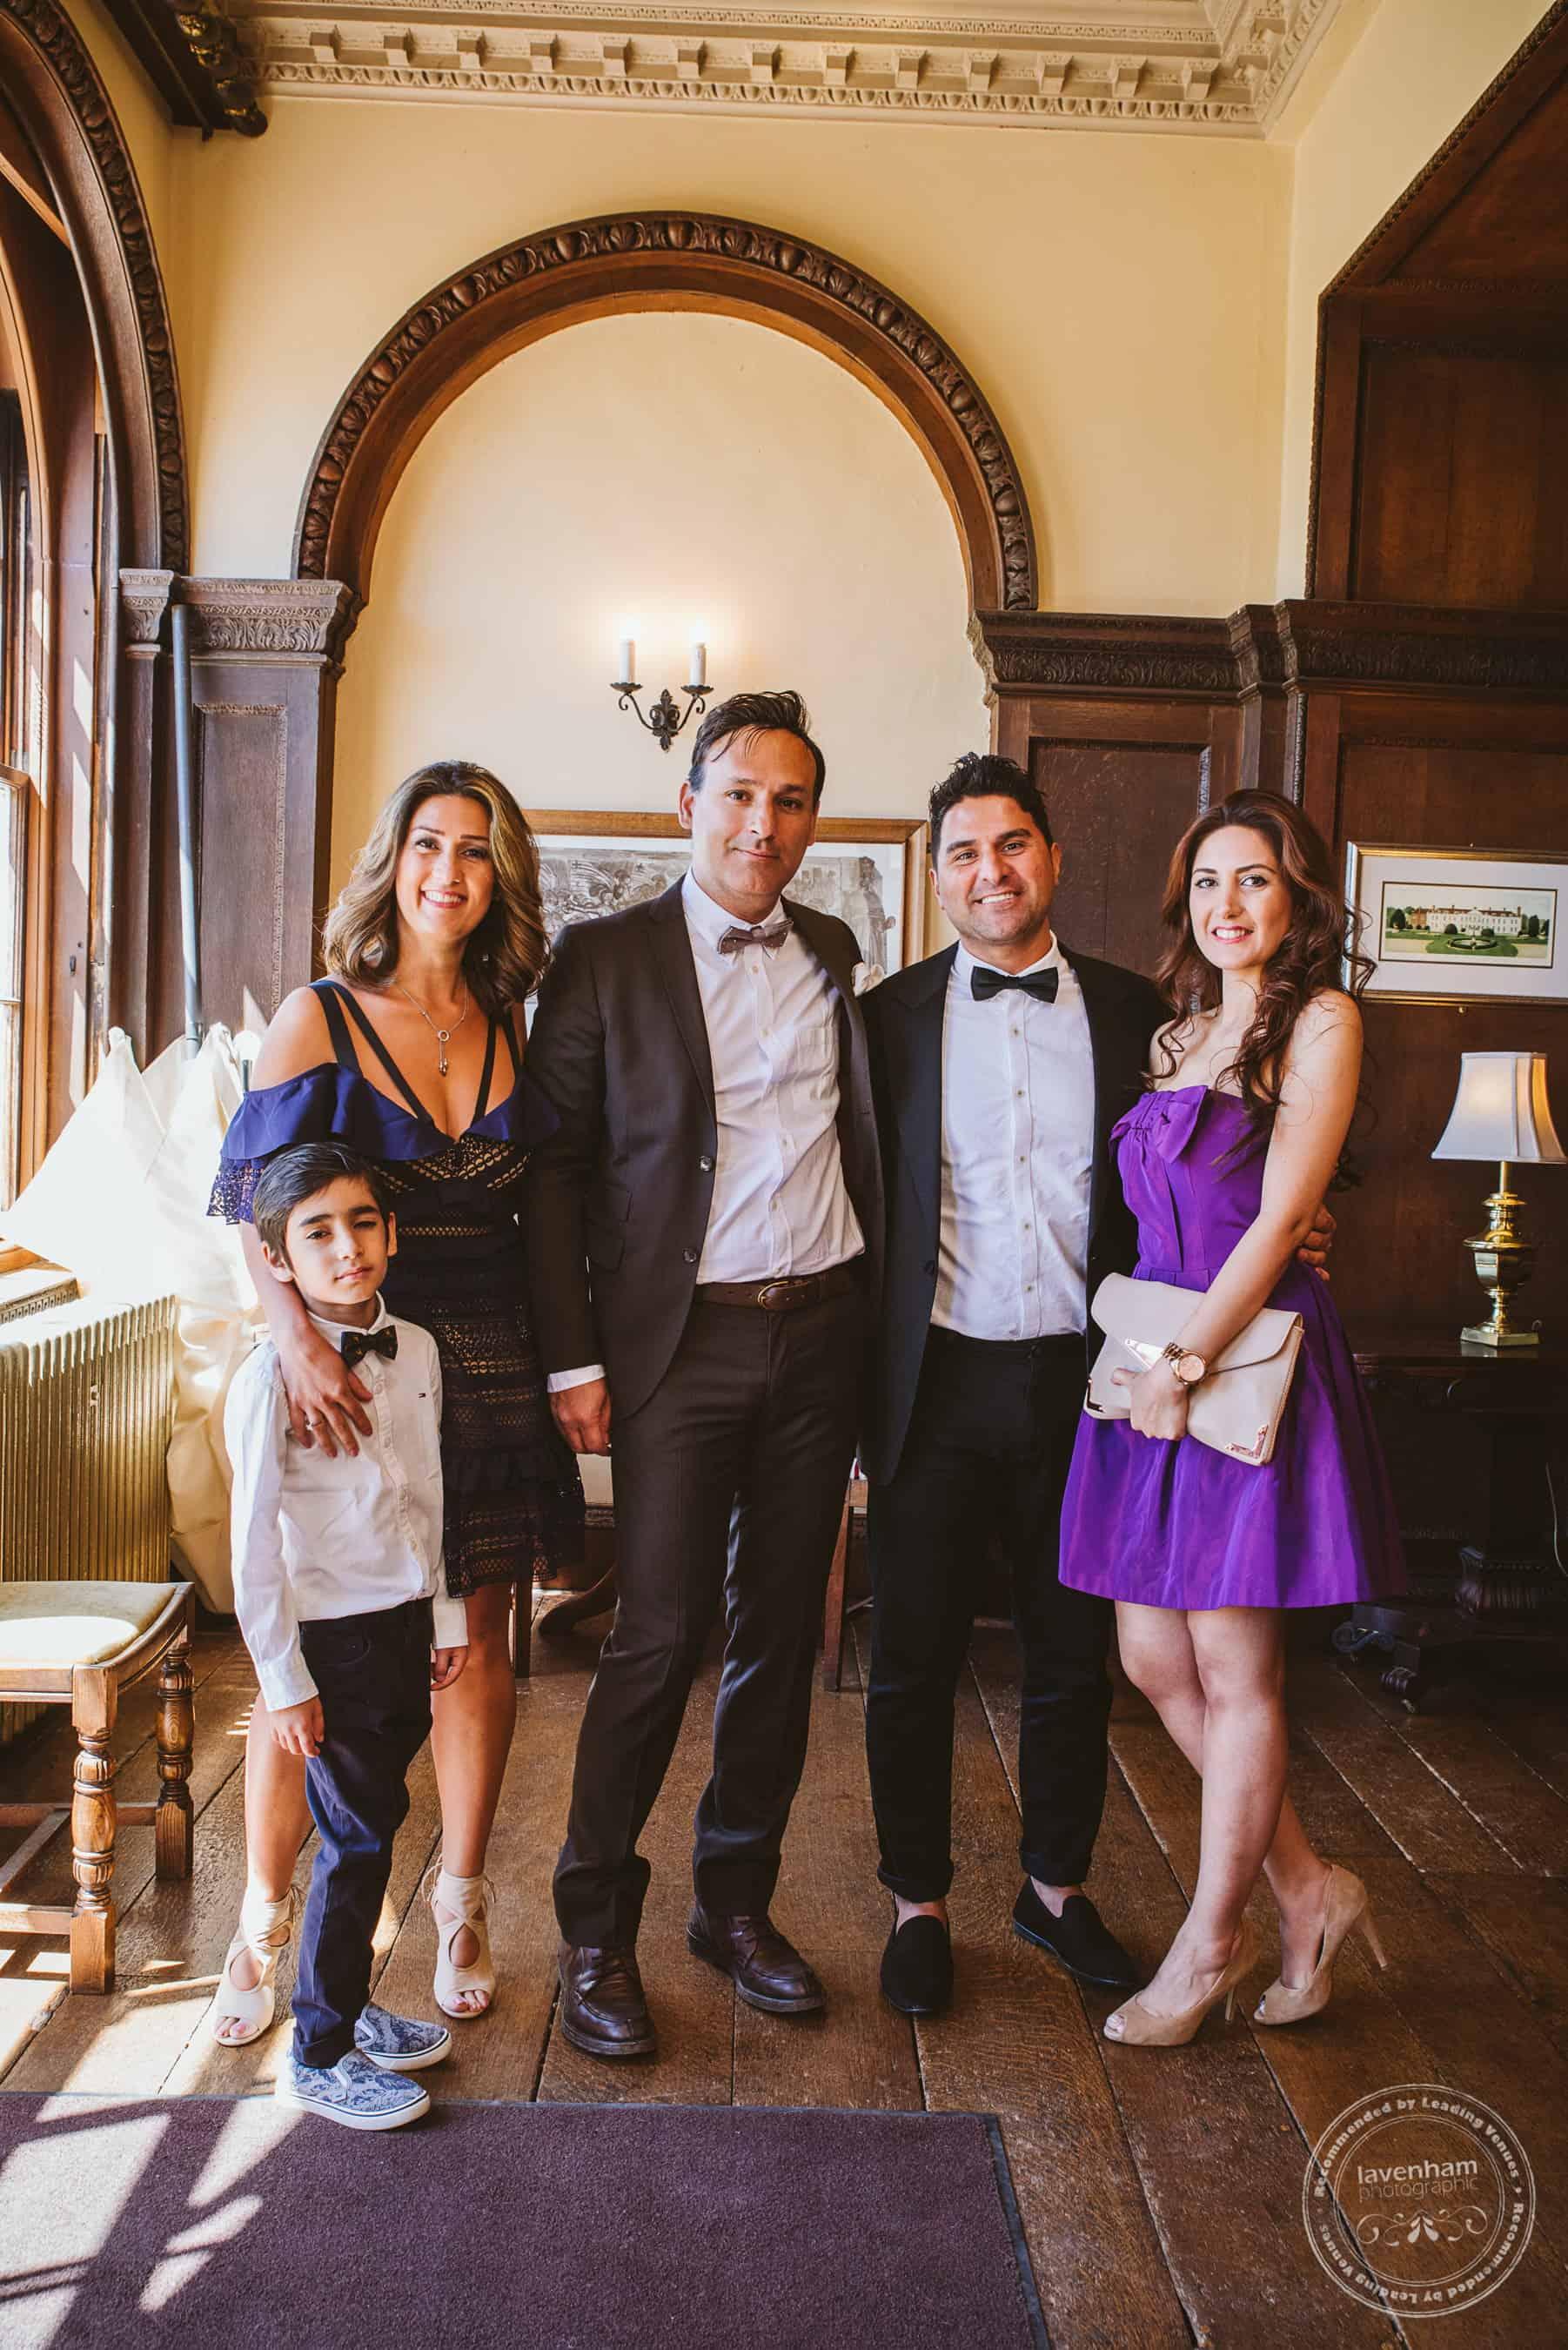 220618 Gosfield Hall Wedding Photography Lavenham Photographic 0058